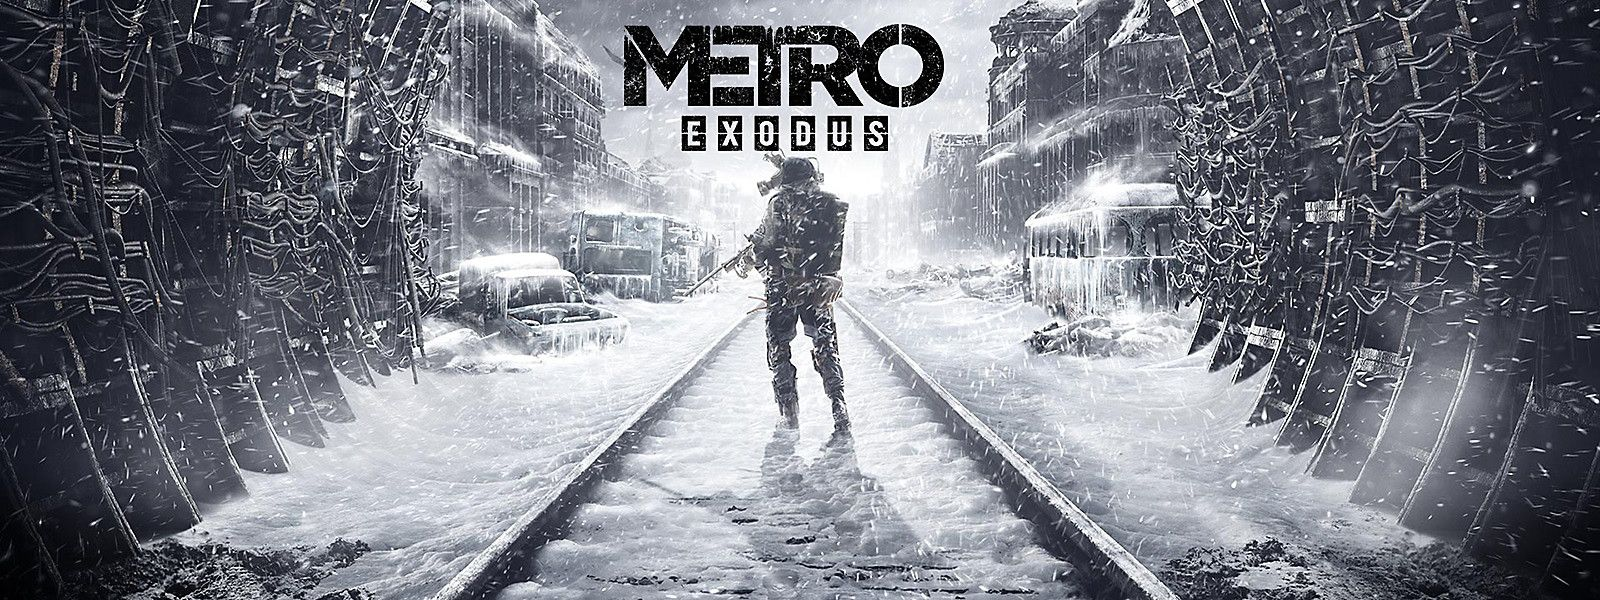 Metro Exodus Wallpaper 4k In 2019 Epic Games Xbox One Hd